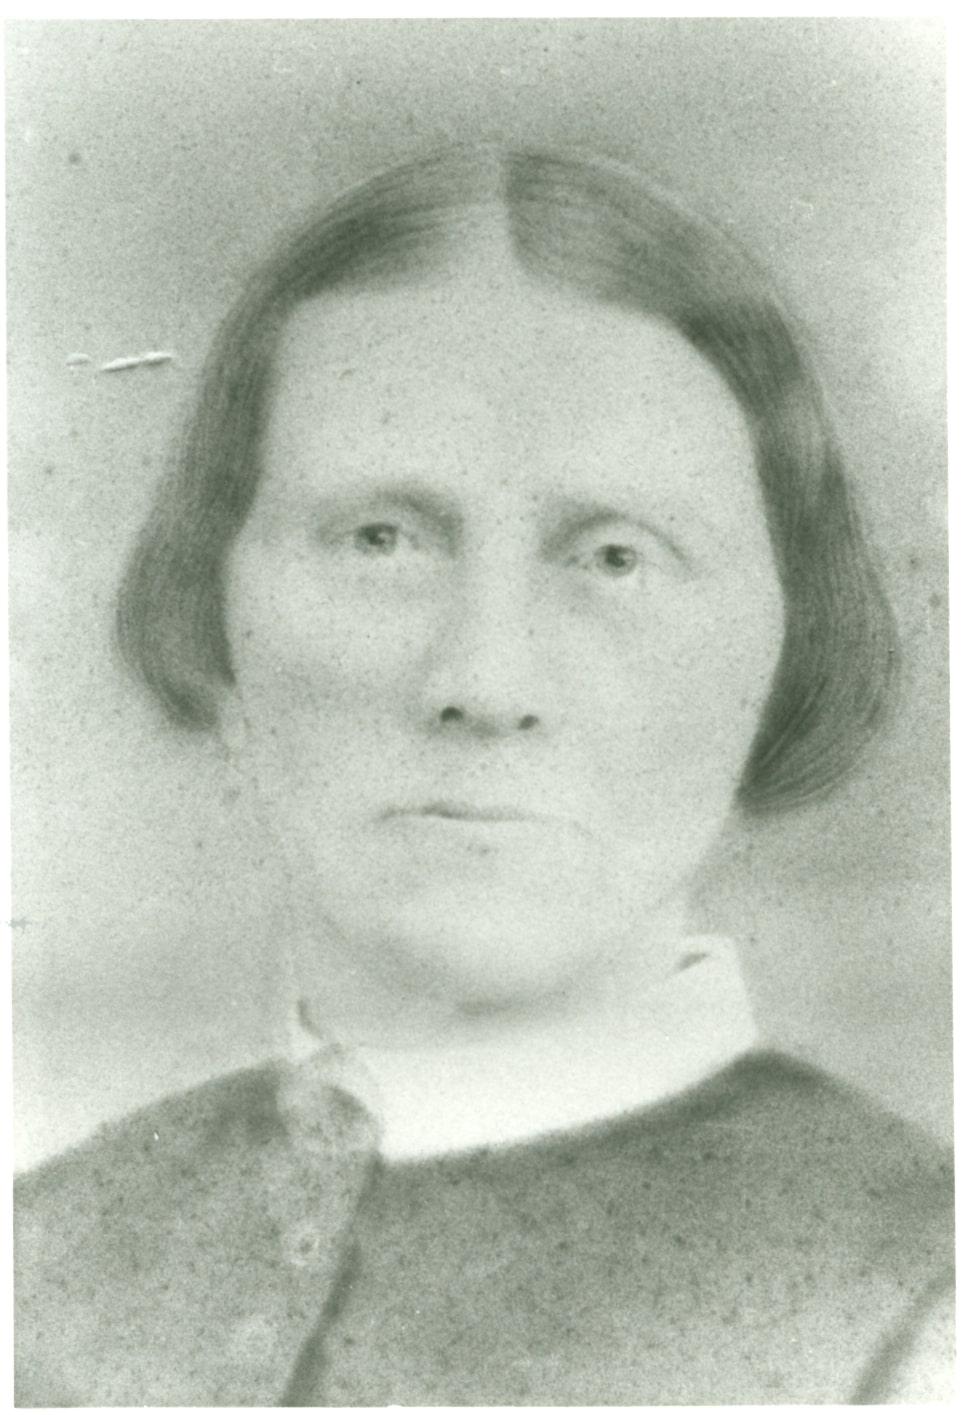 Ann Eliza Street, daughter of Timothy Street